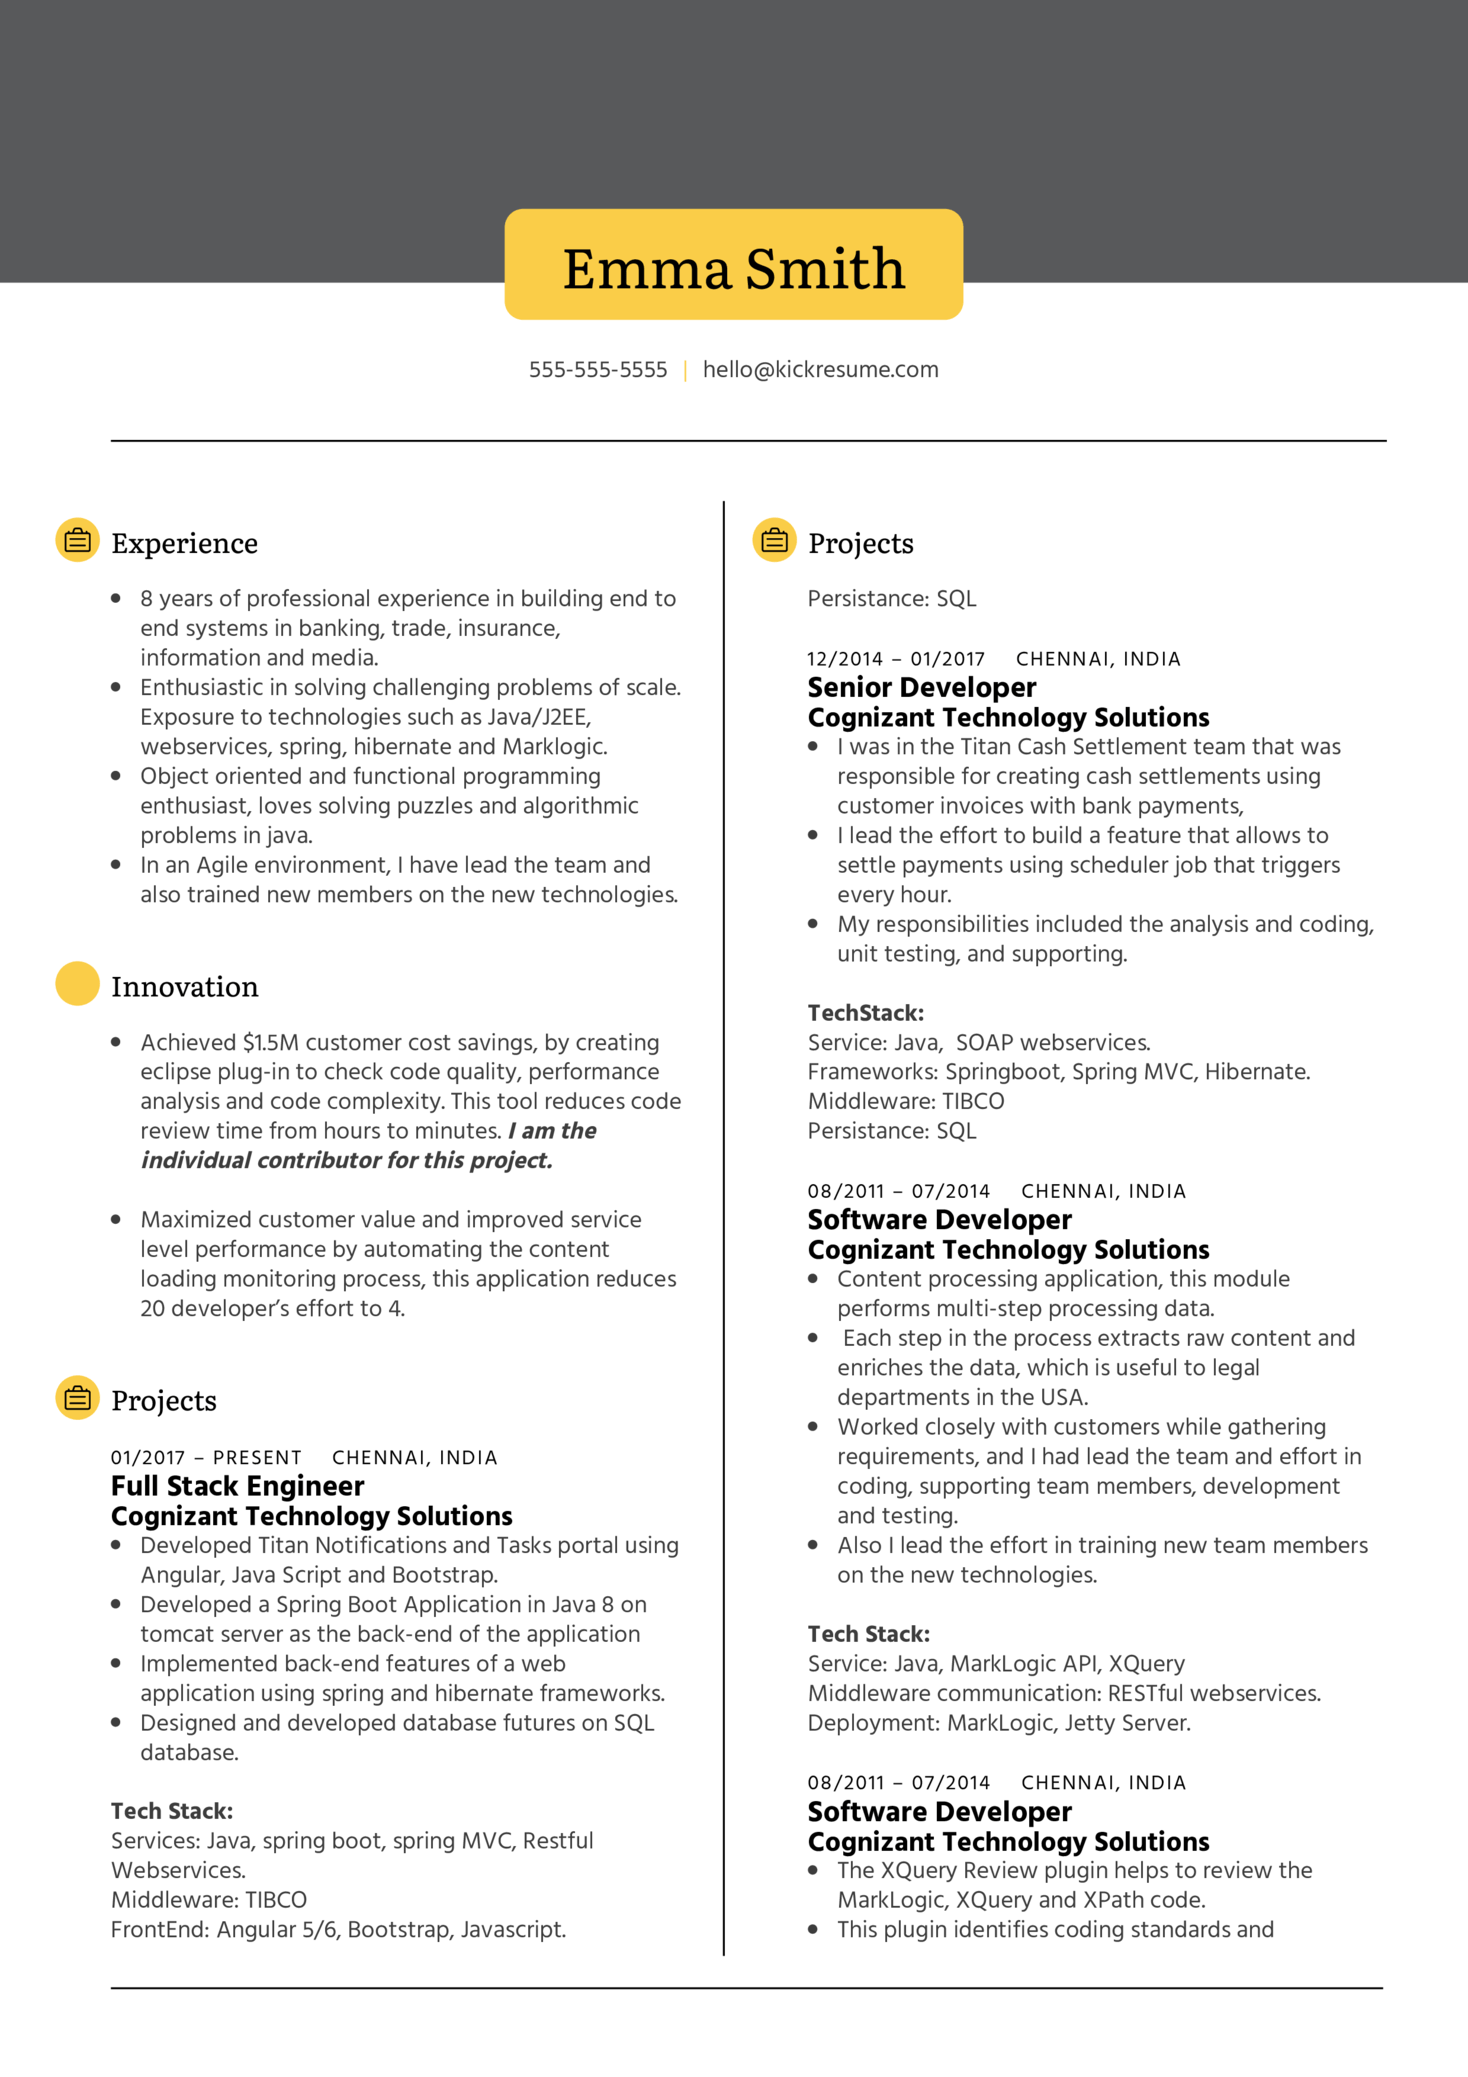 Technical Lead at Standard Chartered Resume Sample (časť 1)